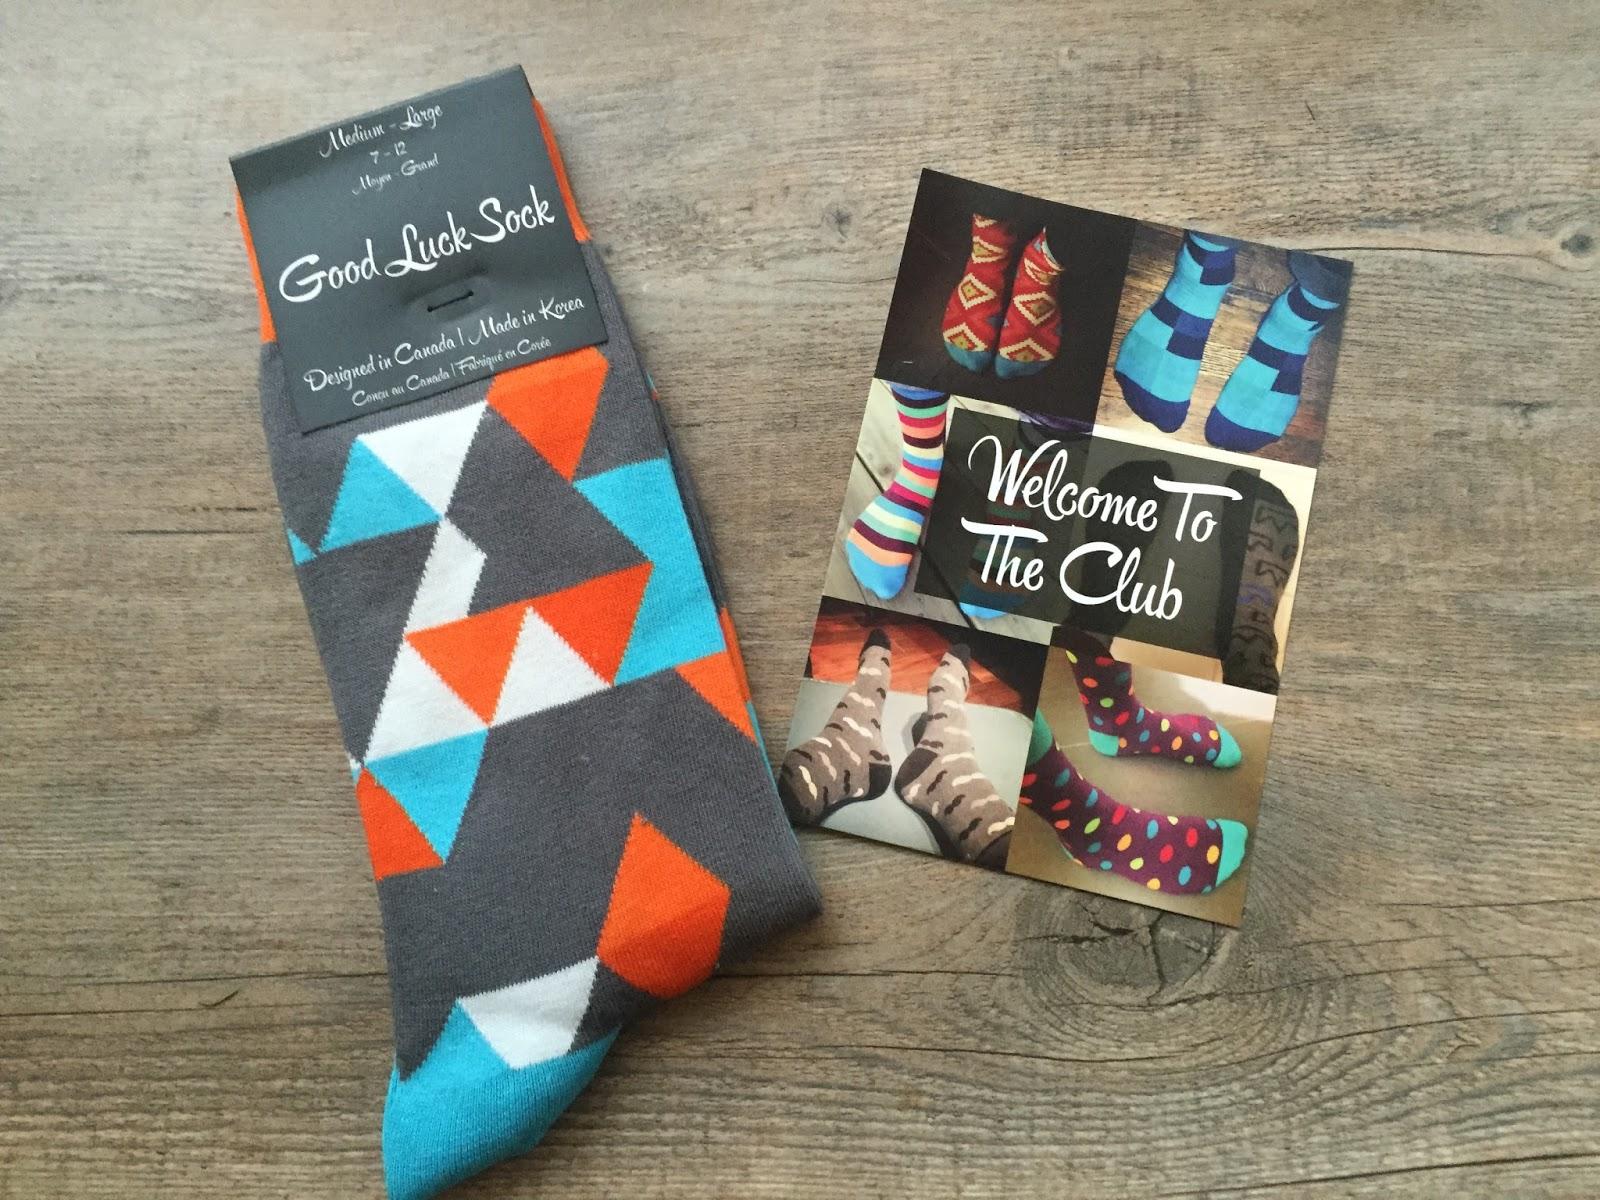 3679d6df1 Good Luck Sock Review - November 2015 - Canadian Sock Subscription